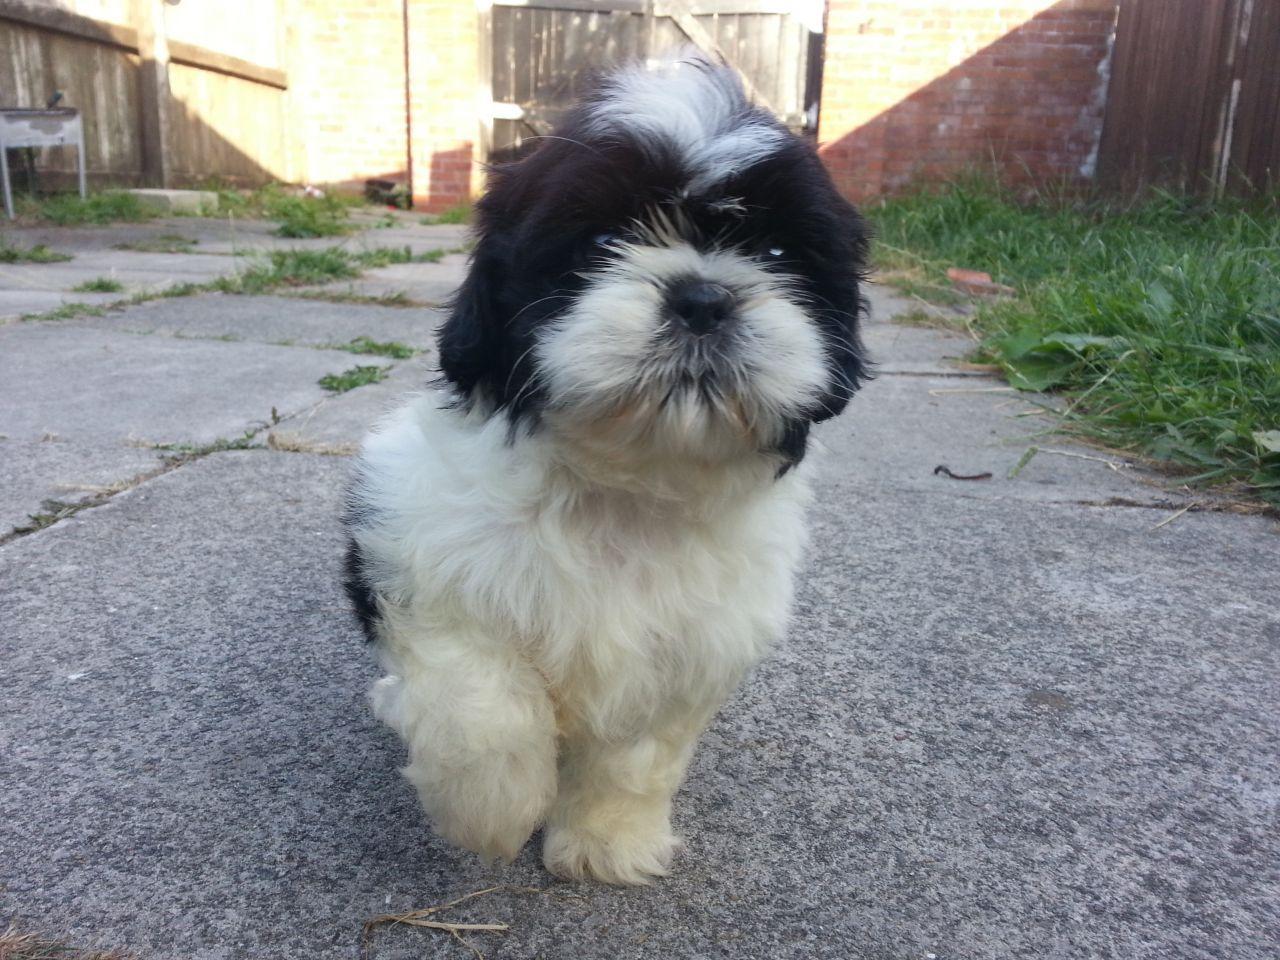 6 Shih Tzu Puppies Shih Tzu Puppy Shih Tzu Puppies